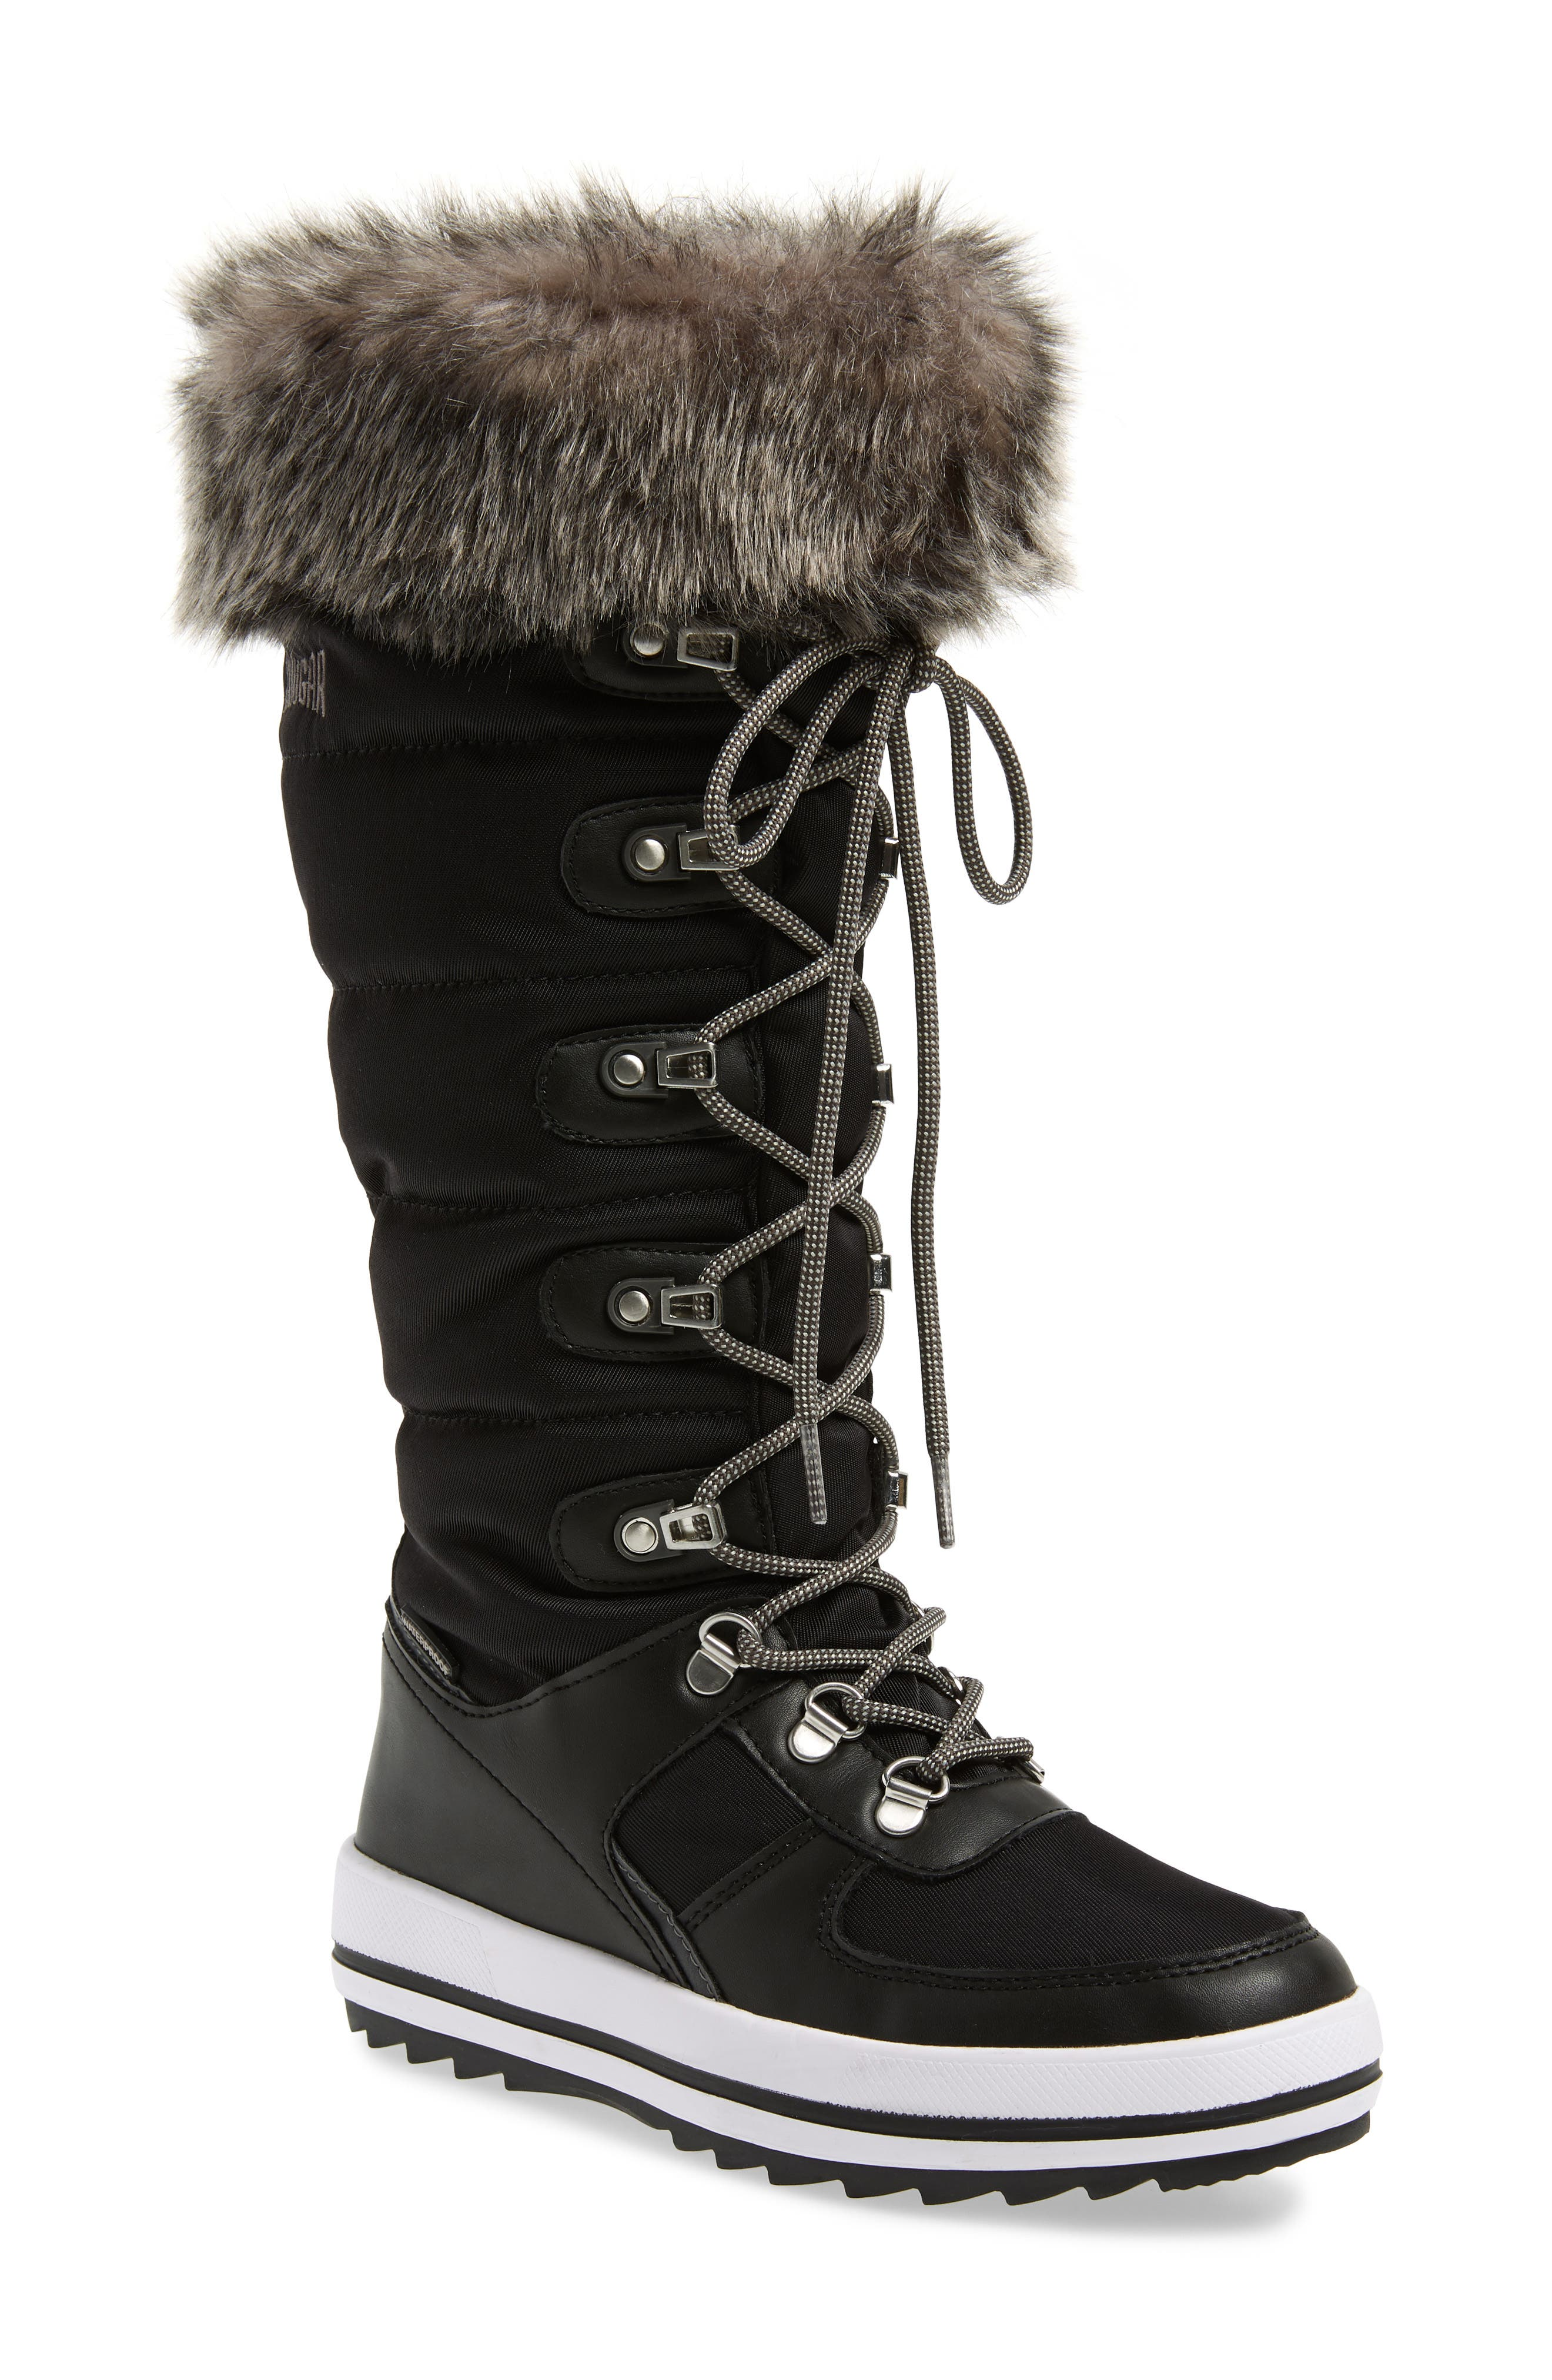 COUGAR Vesta Faux Fur Collar Knee High Snow Boot, Main, color, BLACK FABRIC